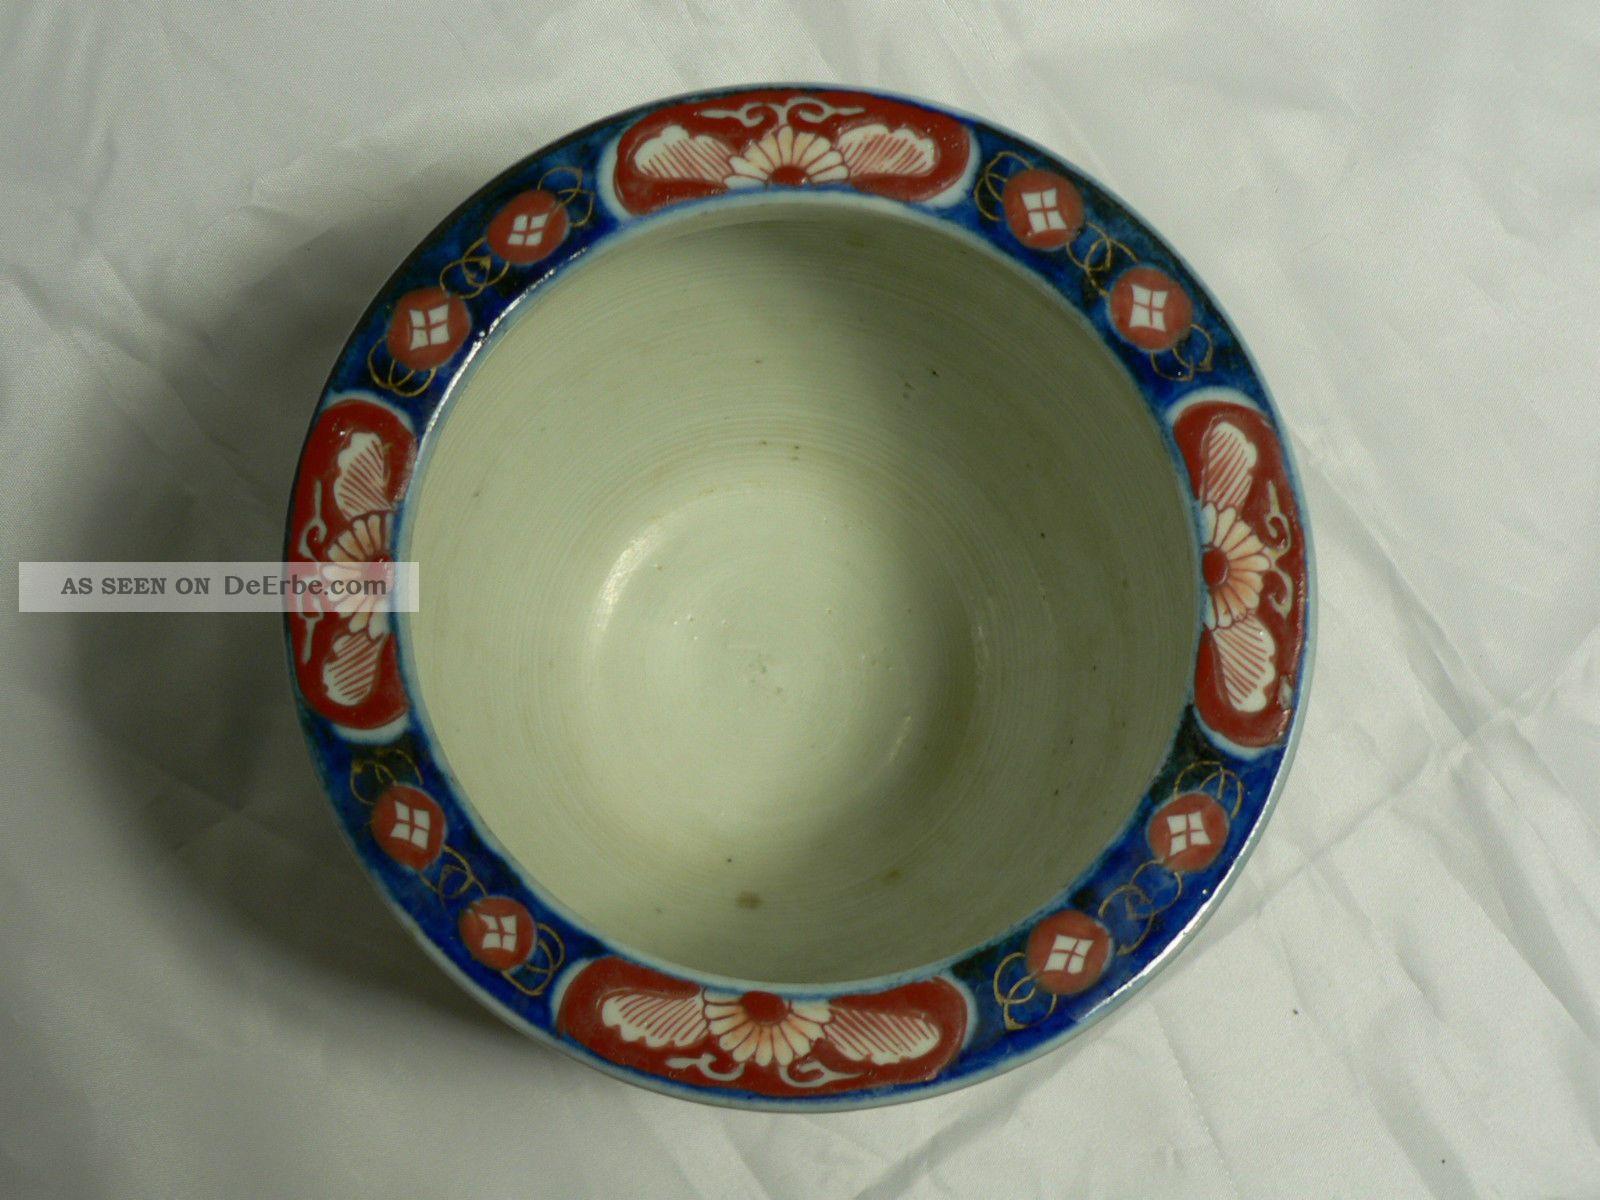 Alter sch ner blumentopf keramik bertopf china oder japan for Blumentopf keramik